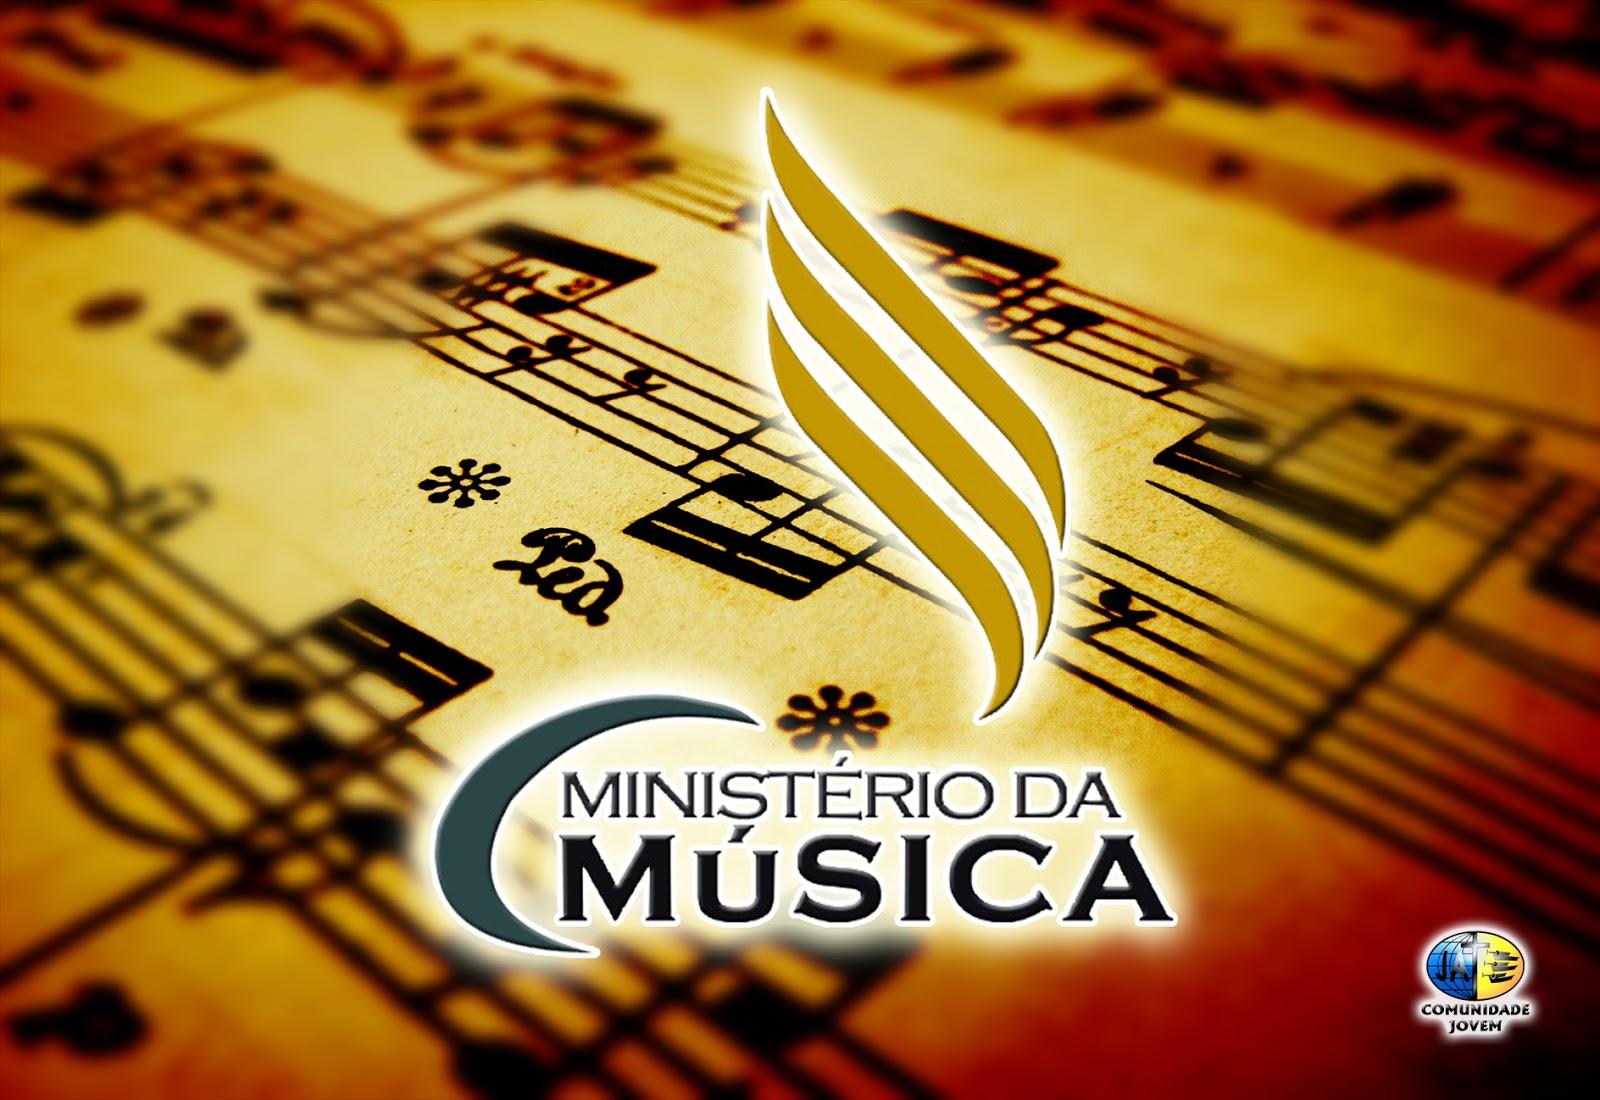 cartc3a3o-musica-grafica.jpg